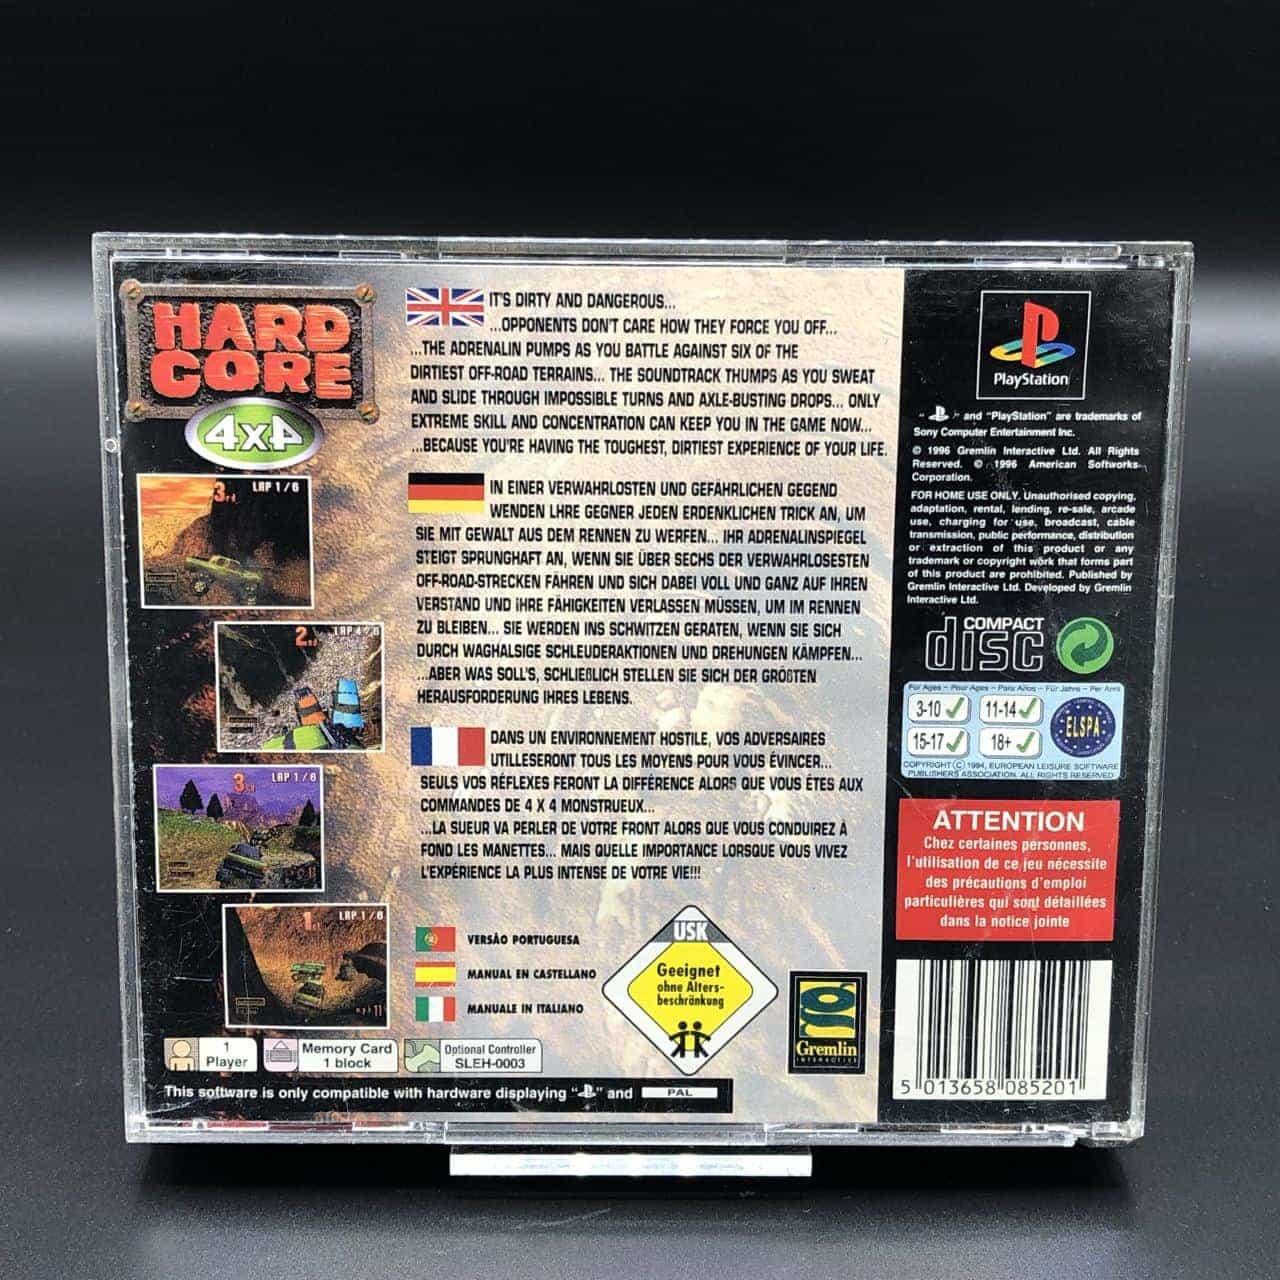 PS1 Hard Core 4x4 (Komplett) (Sehr gut) Sony PlayStation 1